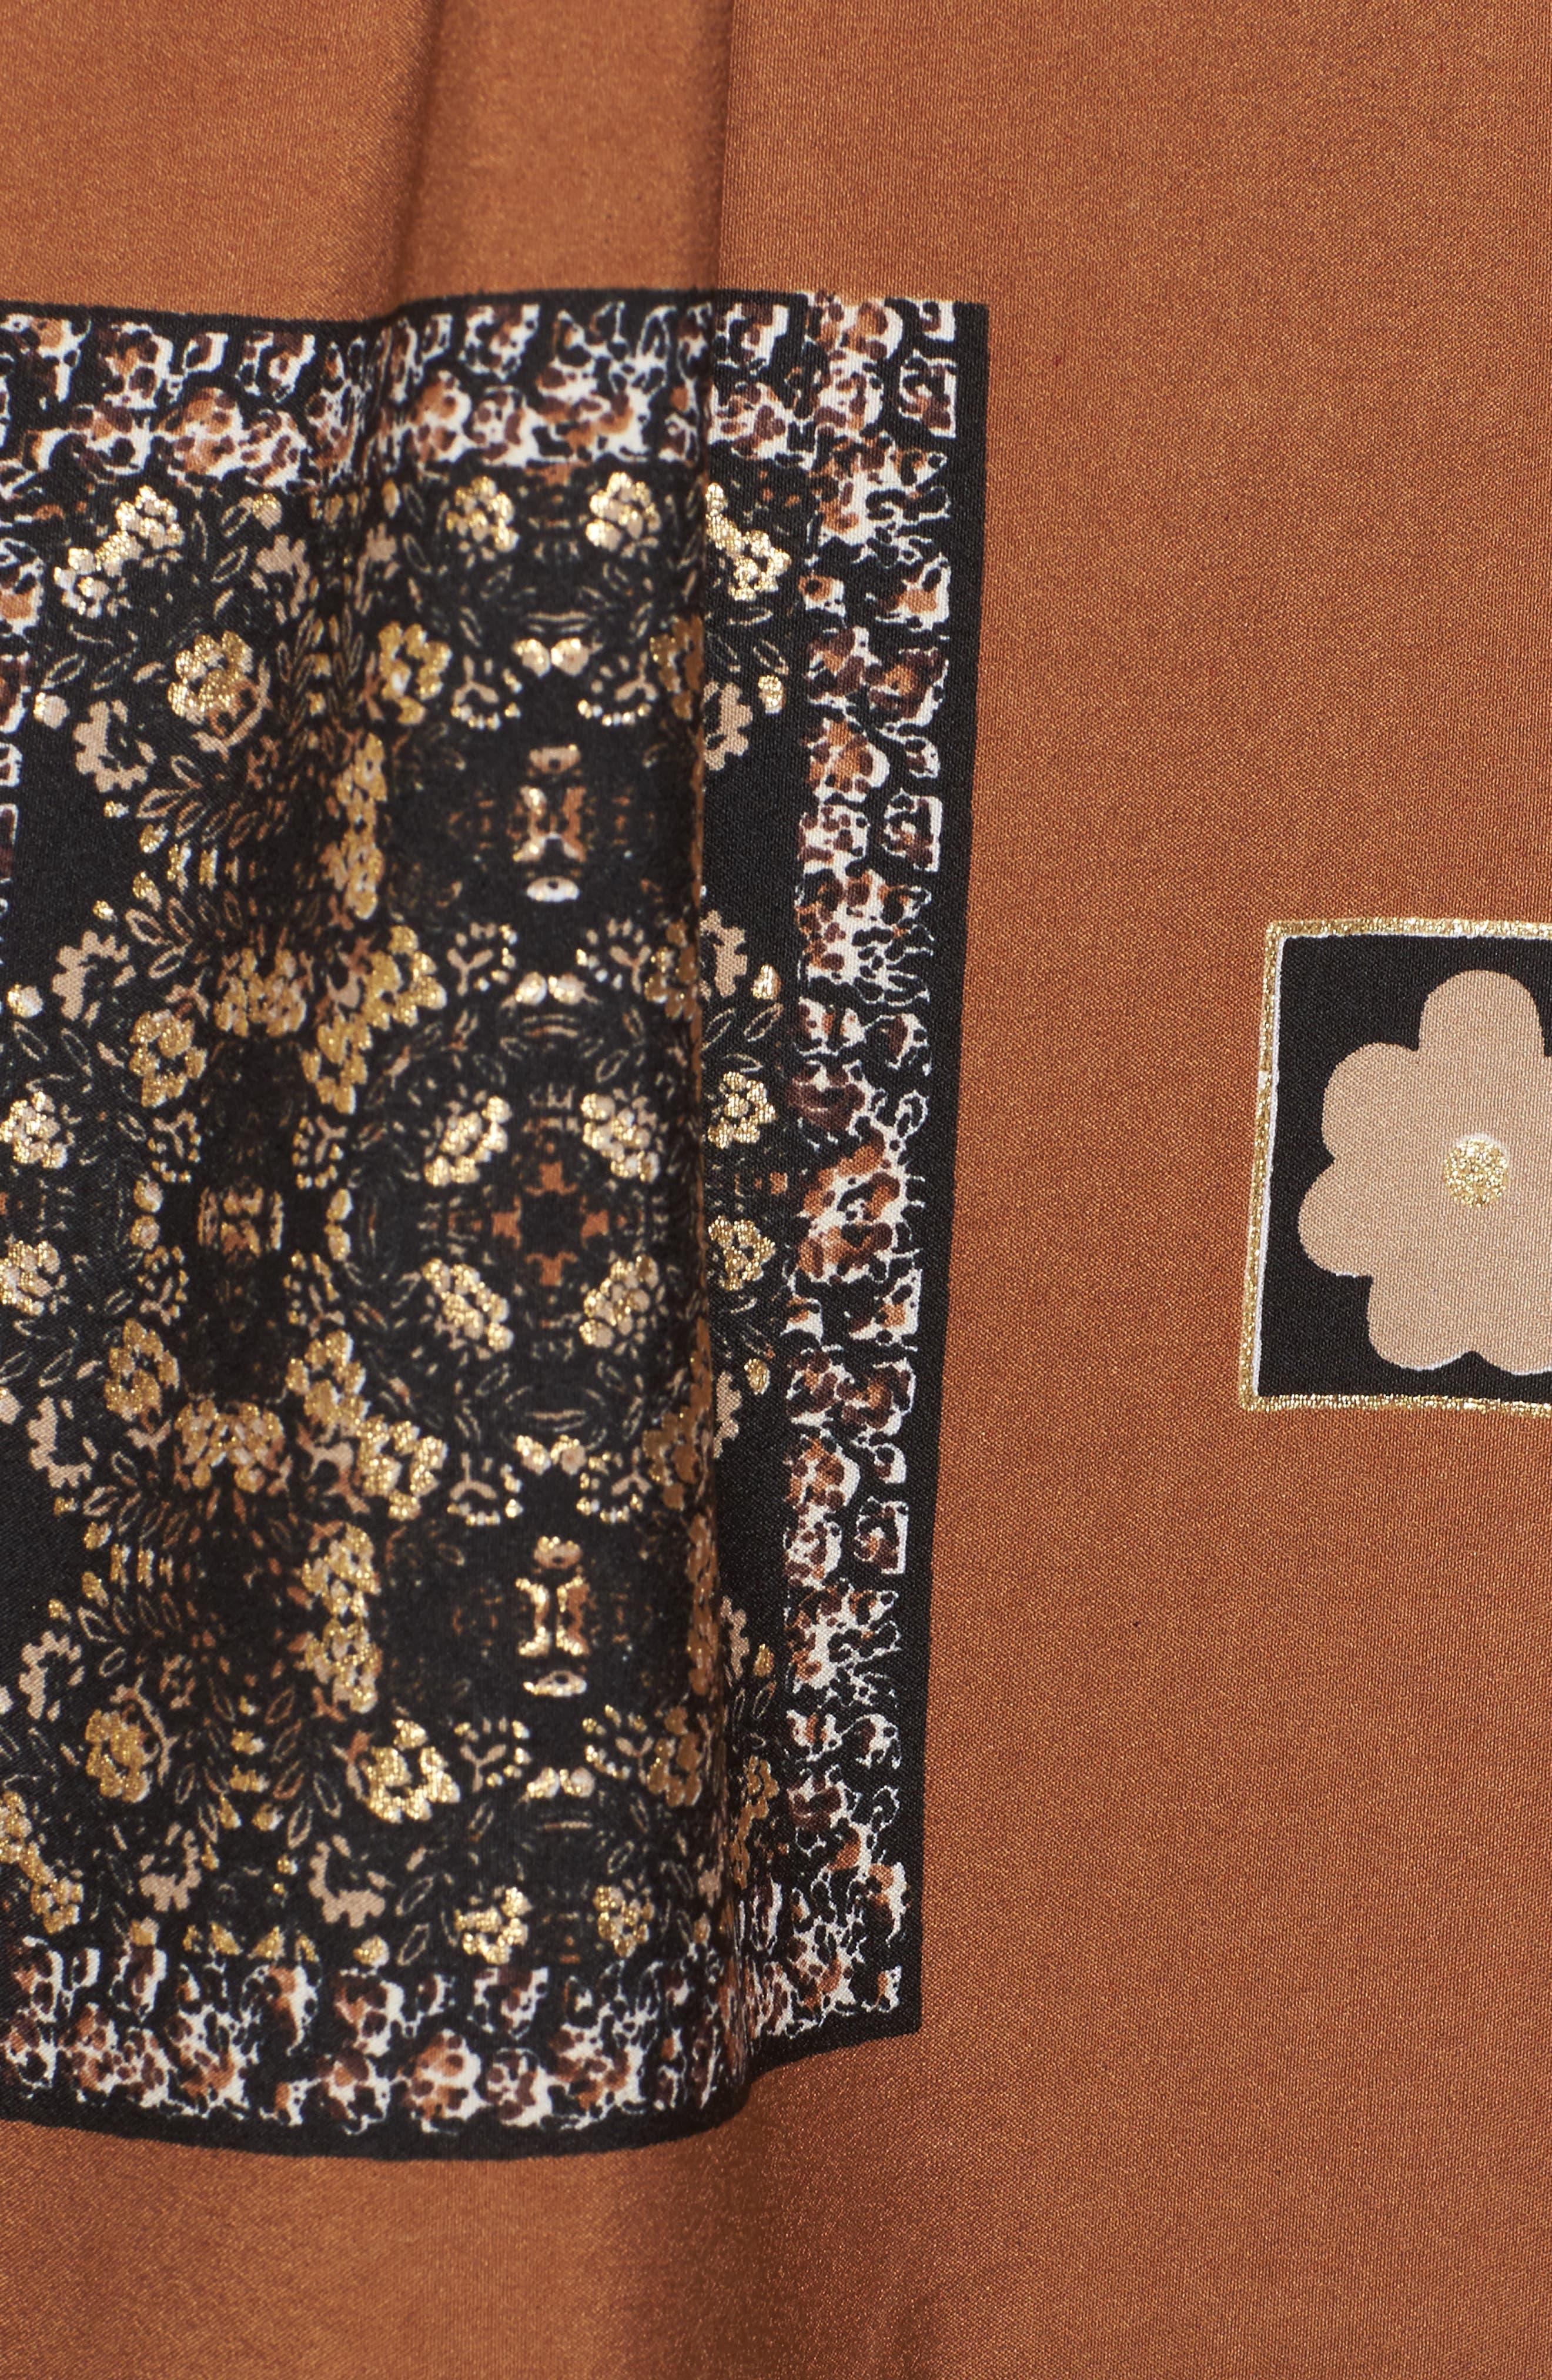 Sonder Print Plunging Minidress,                             Alternate thumbnail 5, color,                             Brown